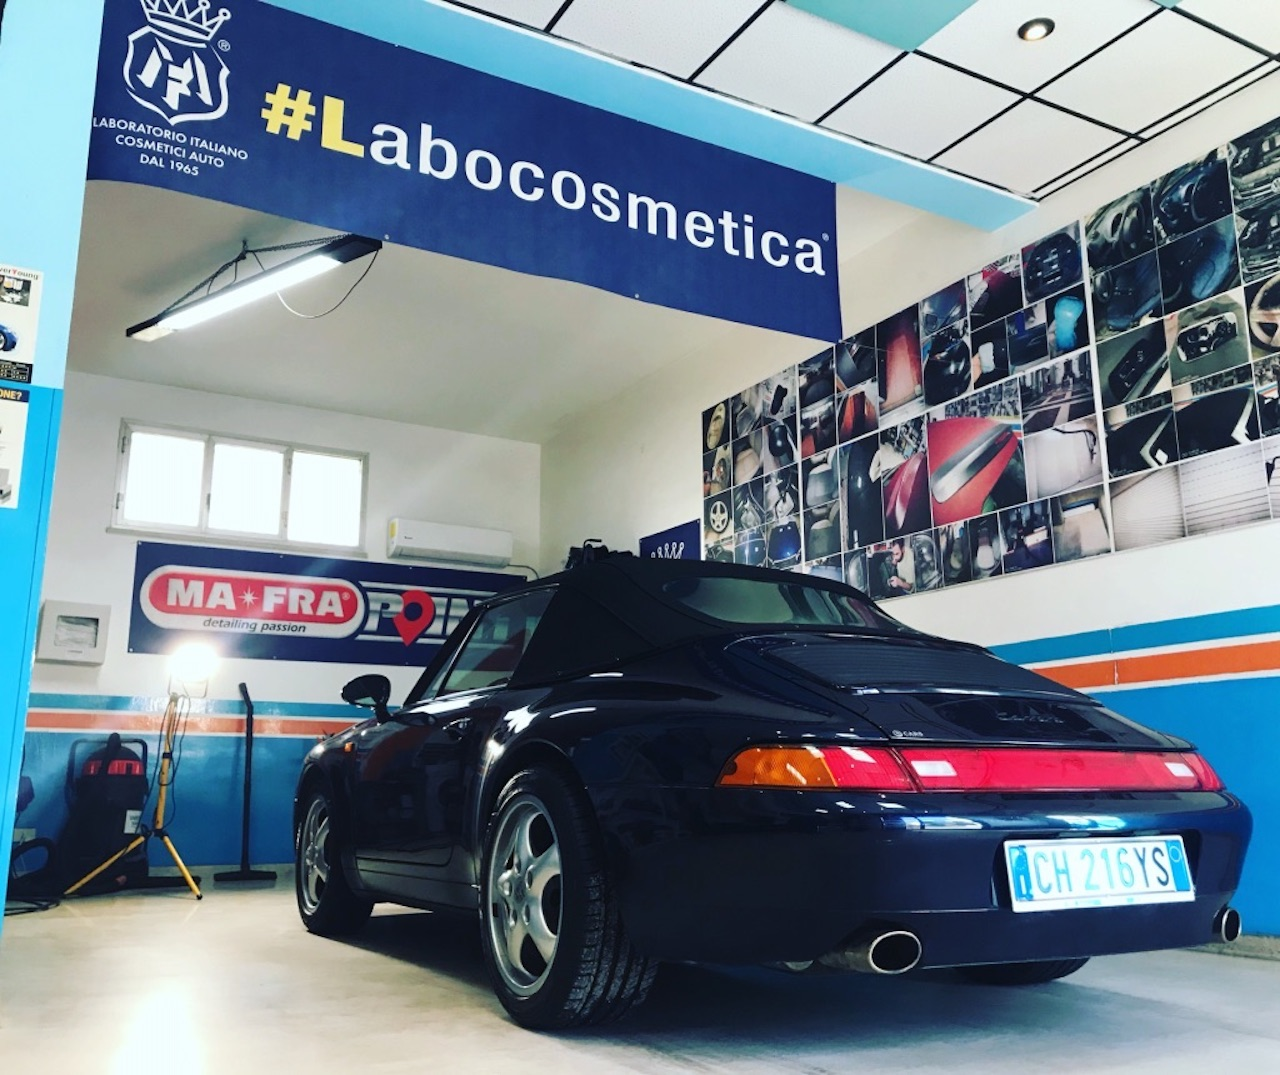 Porsche 911 (993) - #Labocosmetica - Full Detailing